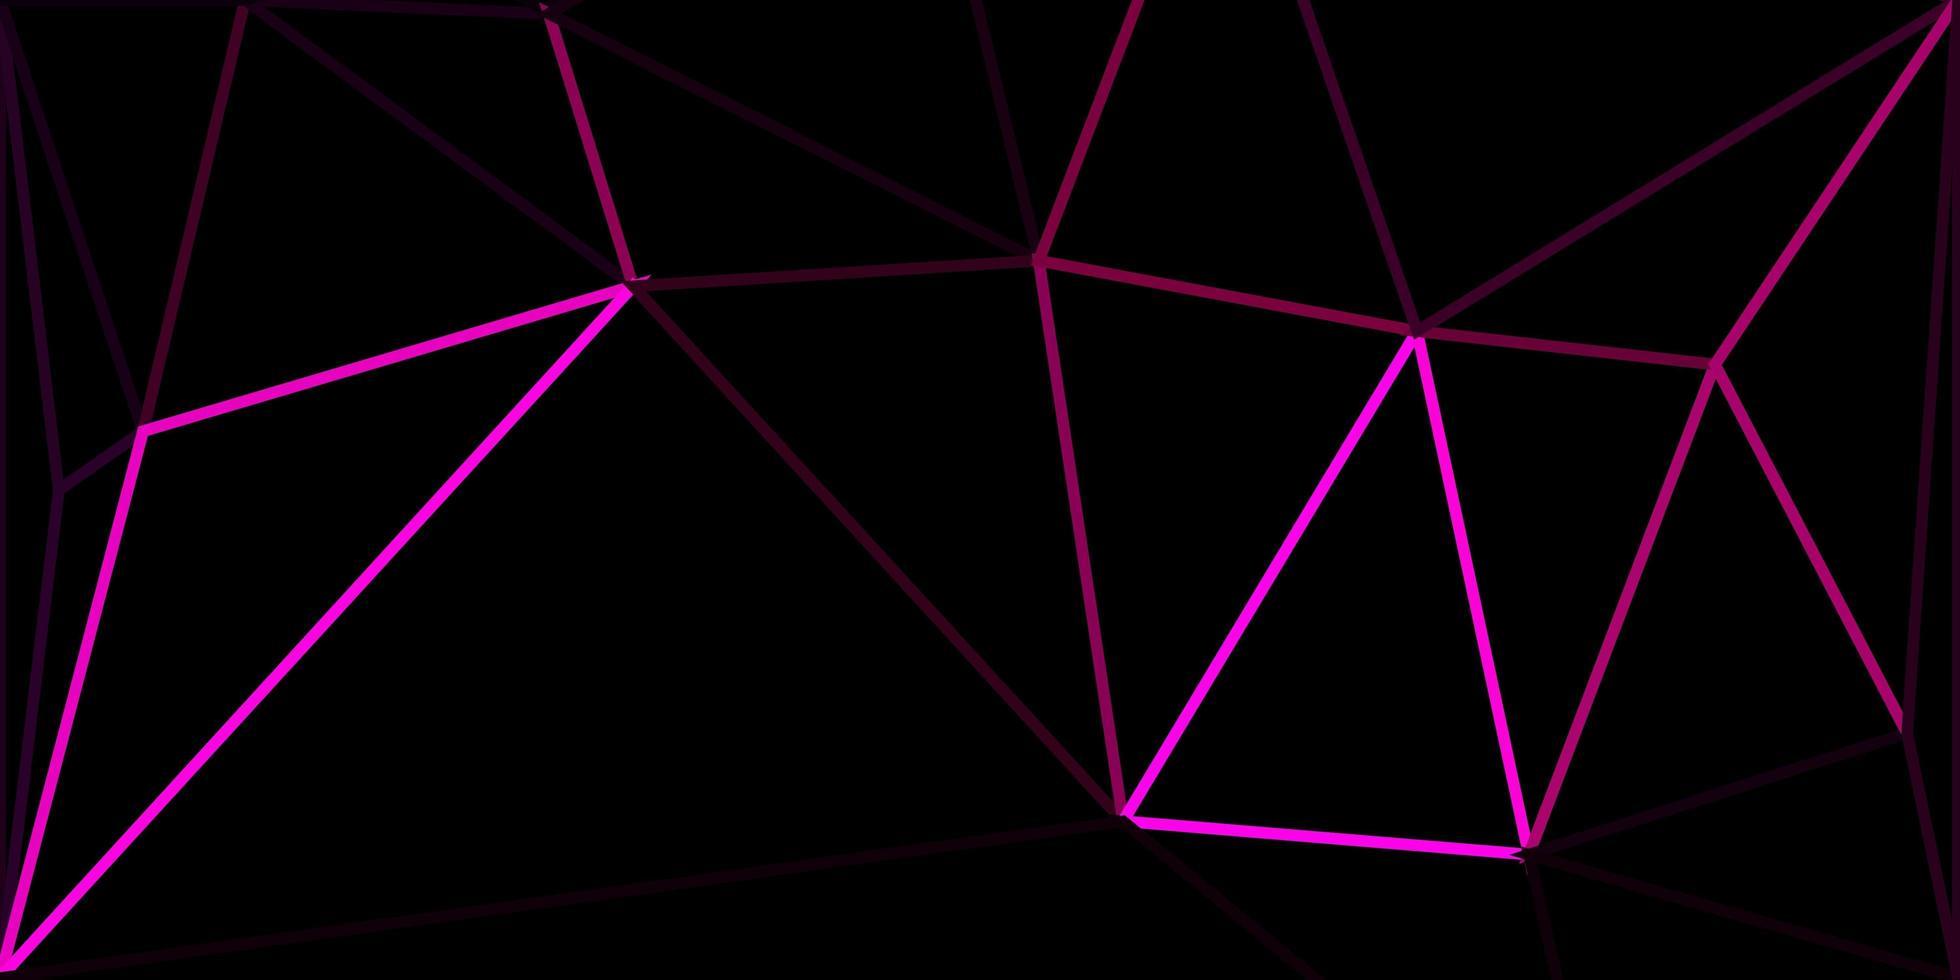 textura de triángulo de poli rosa oscuro vector